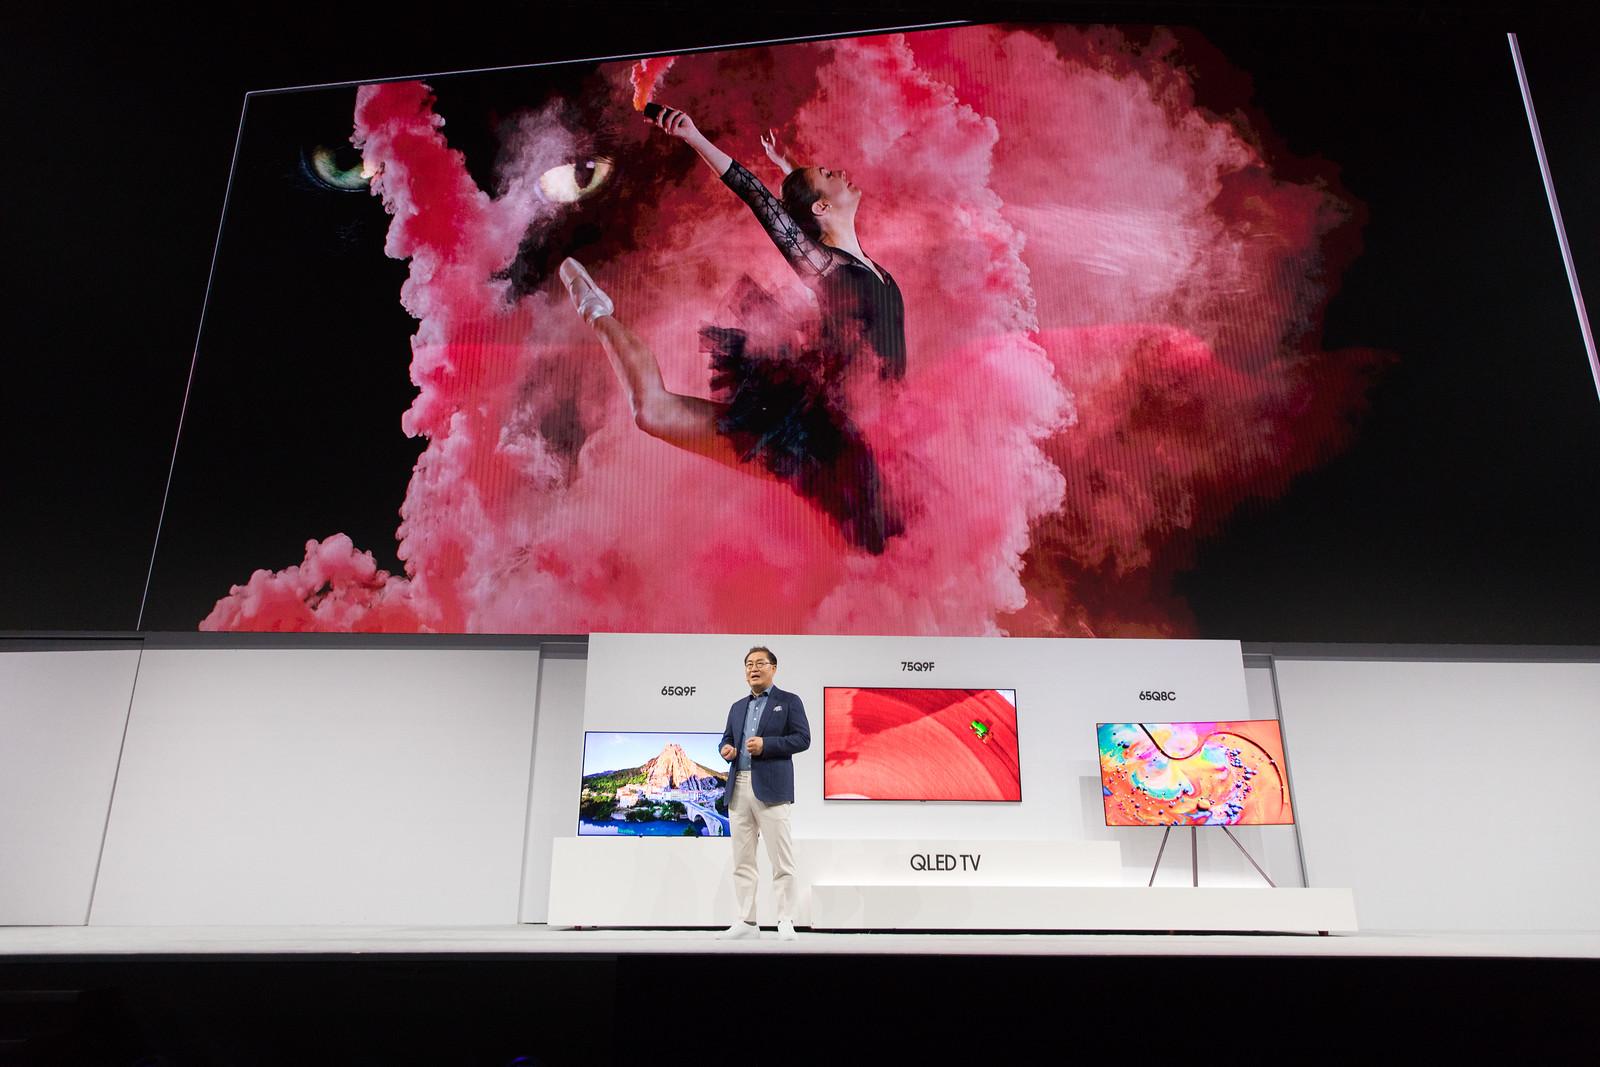 jonghee_han_president_of_visual_display_business_at_samsung_electronics_introducing_the_new_2018_qled_tvs_3.jpg